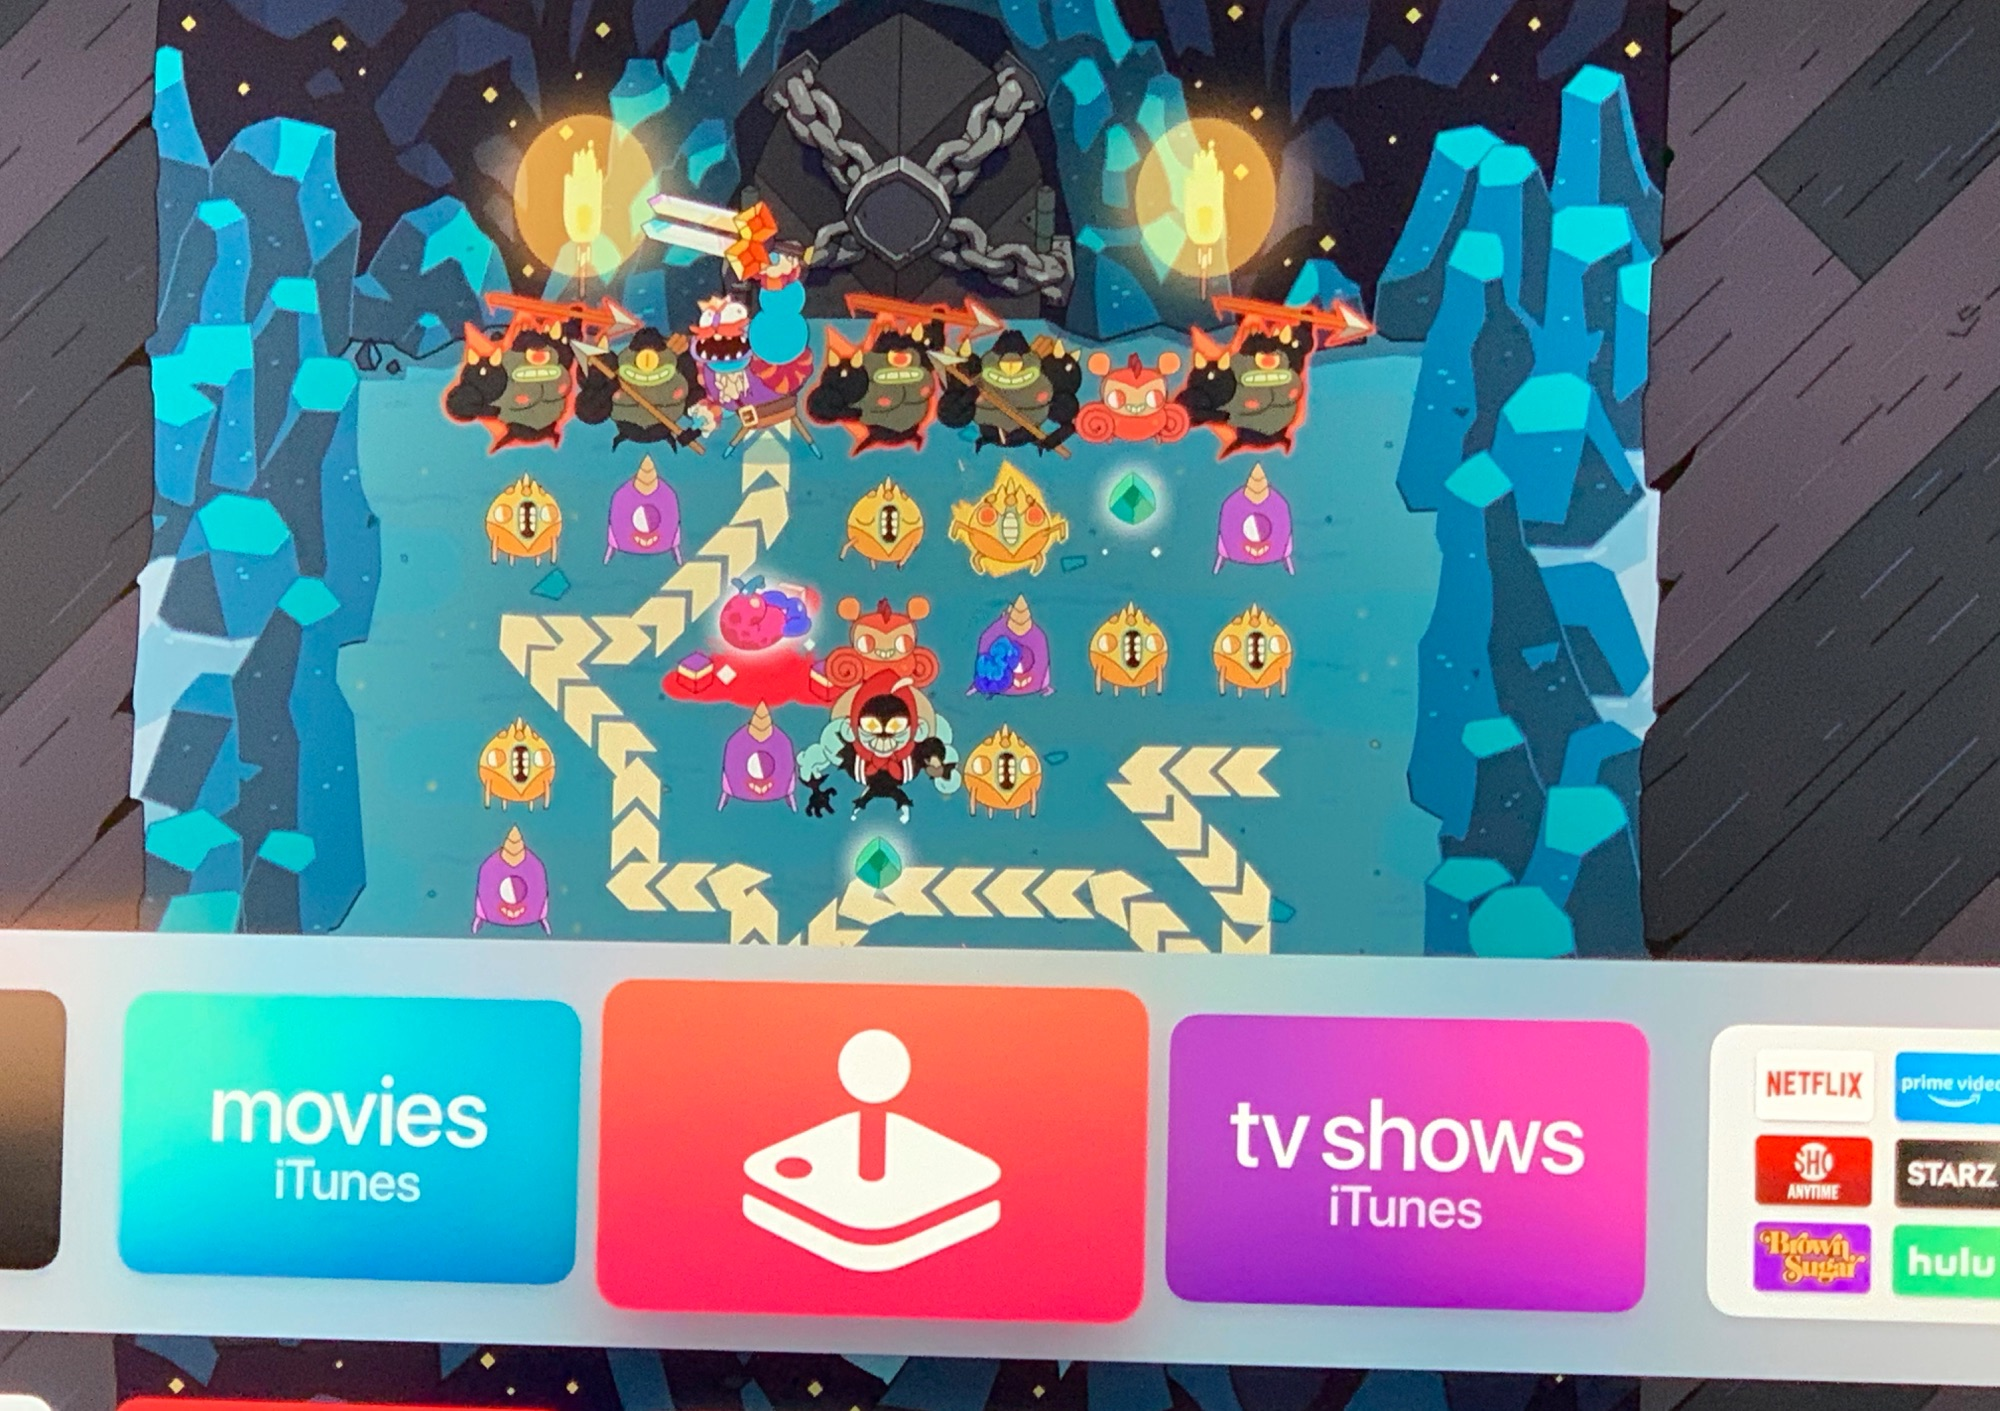 Apple Arcade Now Appearing on Apple TVs Running tvOS 13 GM Beta Build